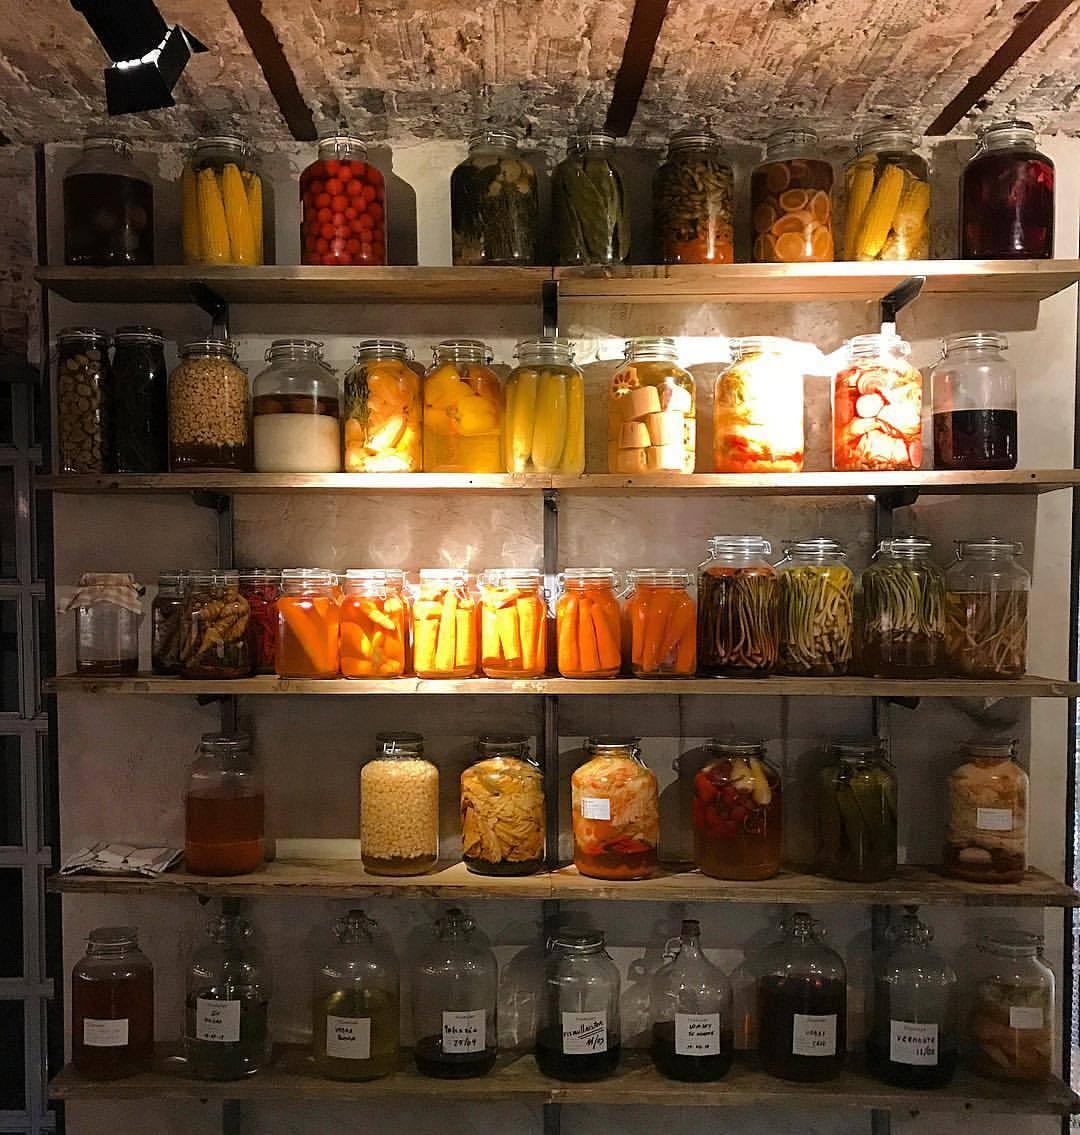 Experimentation.  -  #spain #madrid #food #fermentation #spotfuckingon  (at Fismuler)